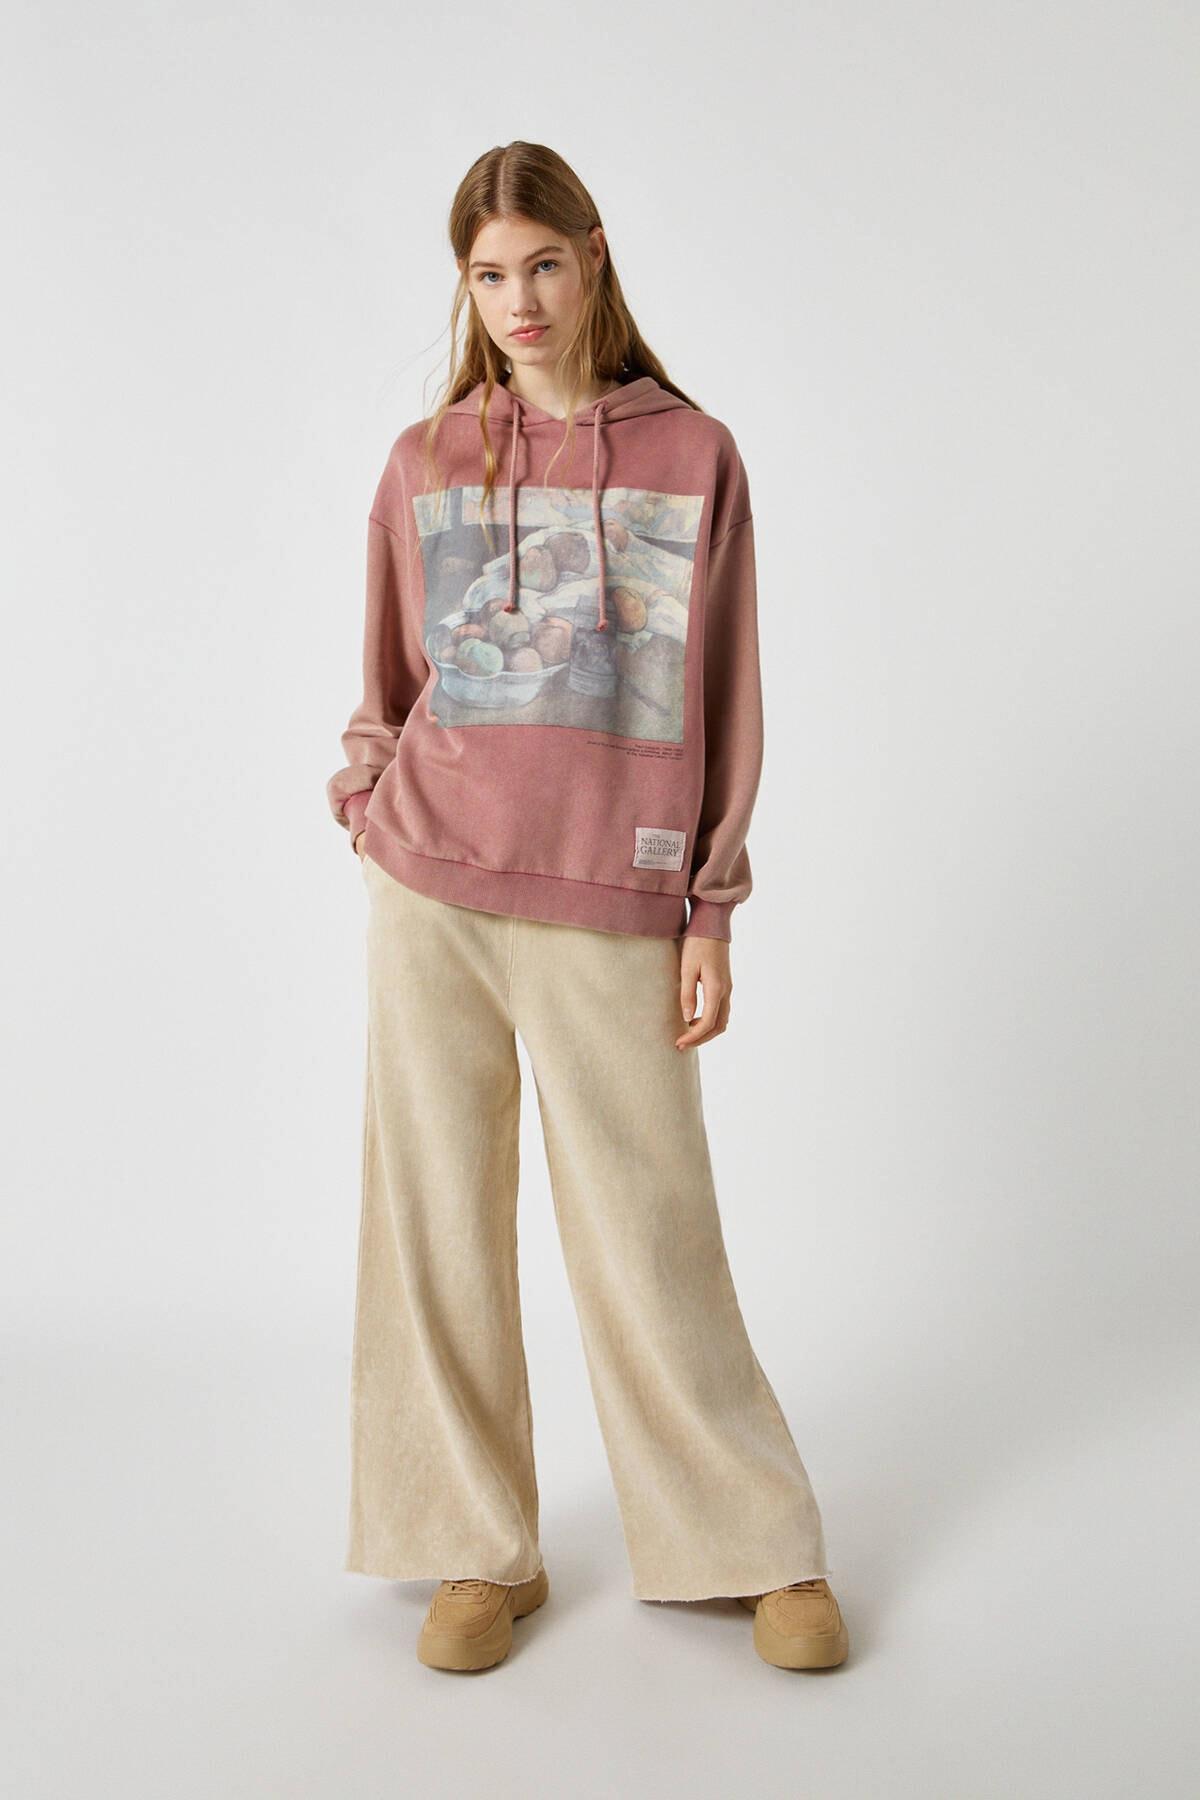 Pull & Bear Kadın Frambuaz Pembe Gauguin Kapüşonlu Sweatshirt 09594340 3